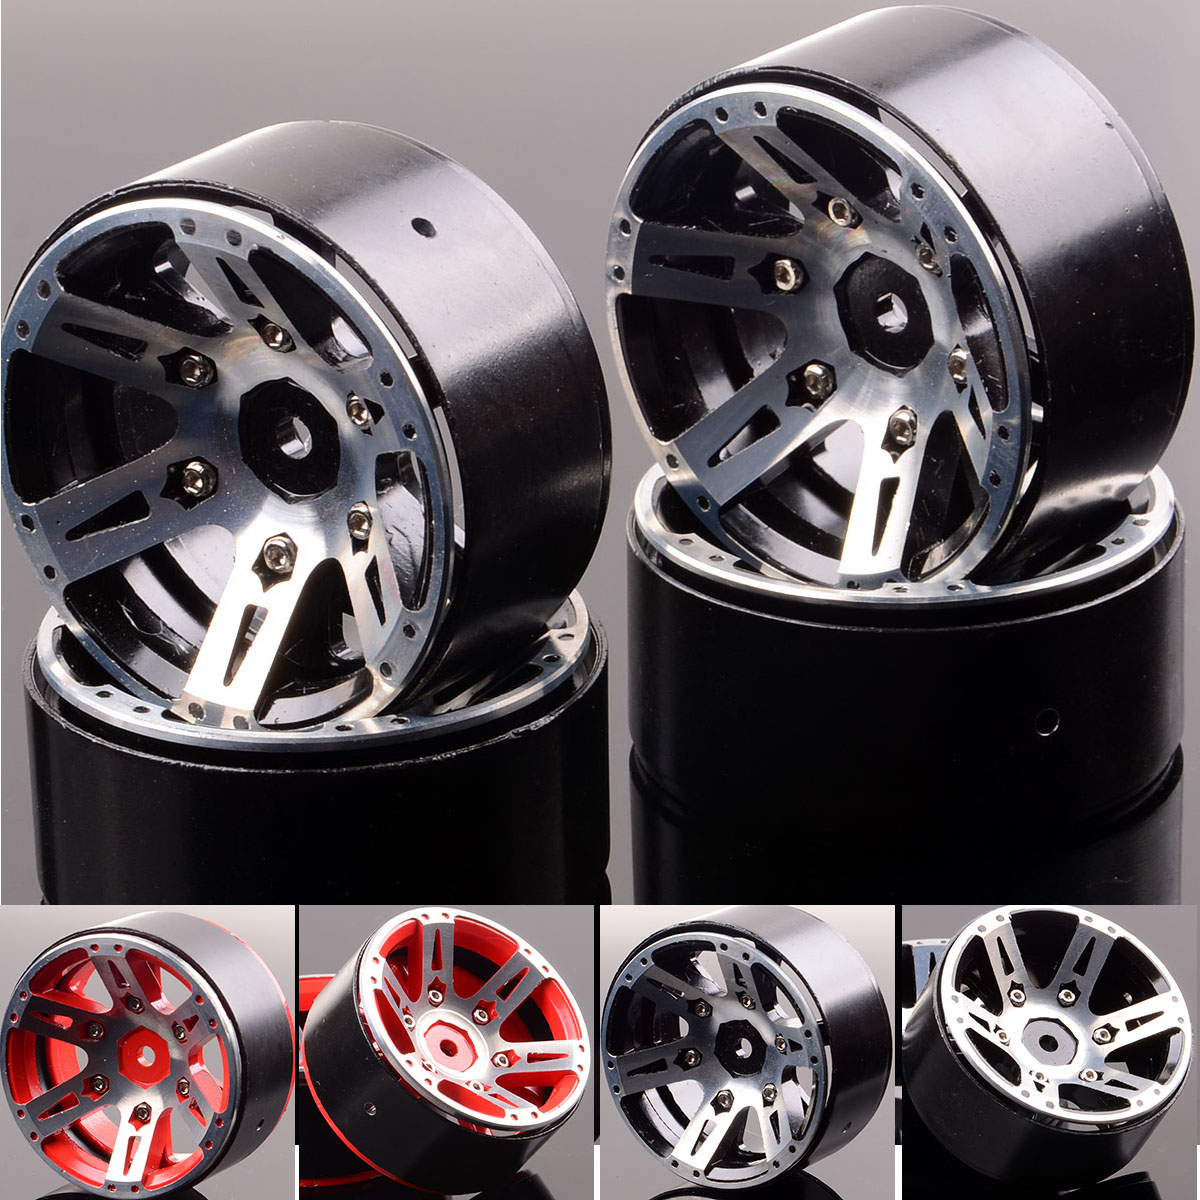 4xAluminum Rock Crawler 1.9 Beadlock Wheel Rim 1059 For RC 1:10 Axial SCX10 D90 4pcs aluminum 1 9 beadlock wheel rims 1060 for 1 10 rc truck rock crawler axial scx10 d90 racing